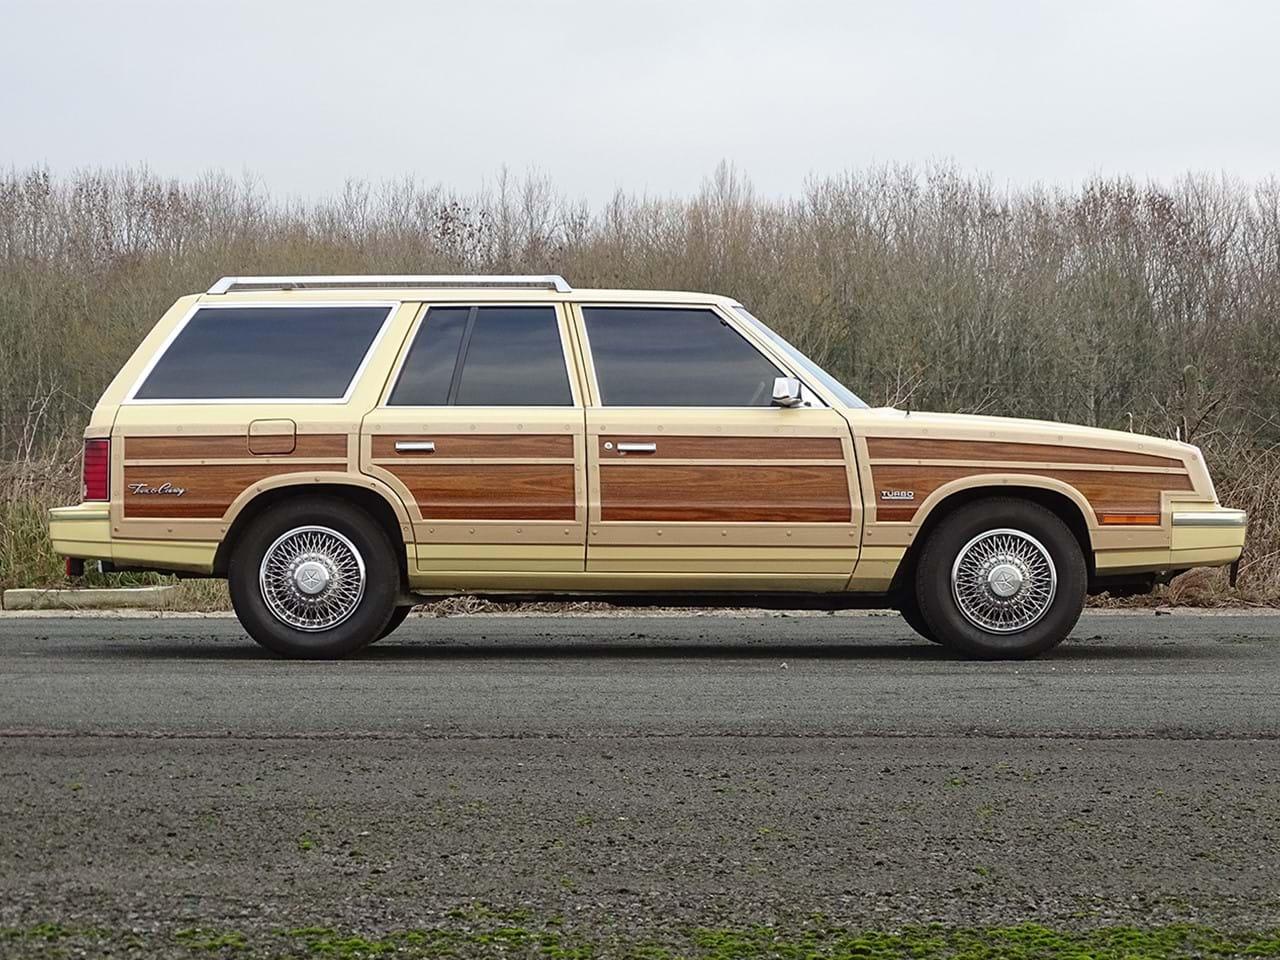 1985 Chrysler LeBaron Town and Country Wagon side profile